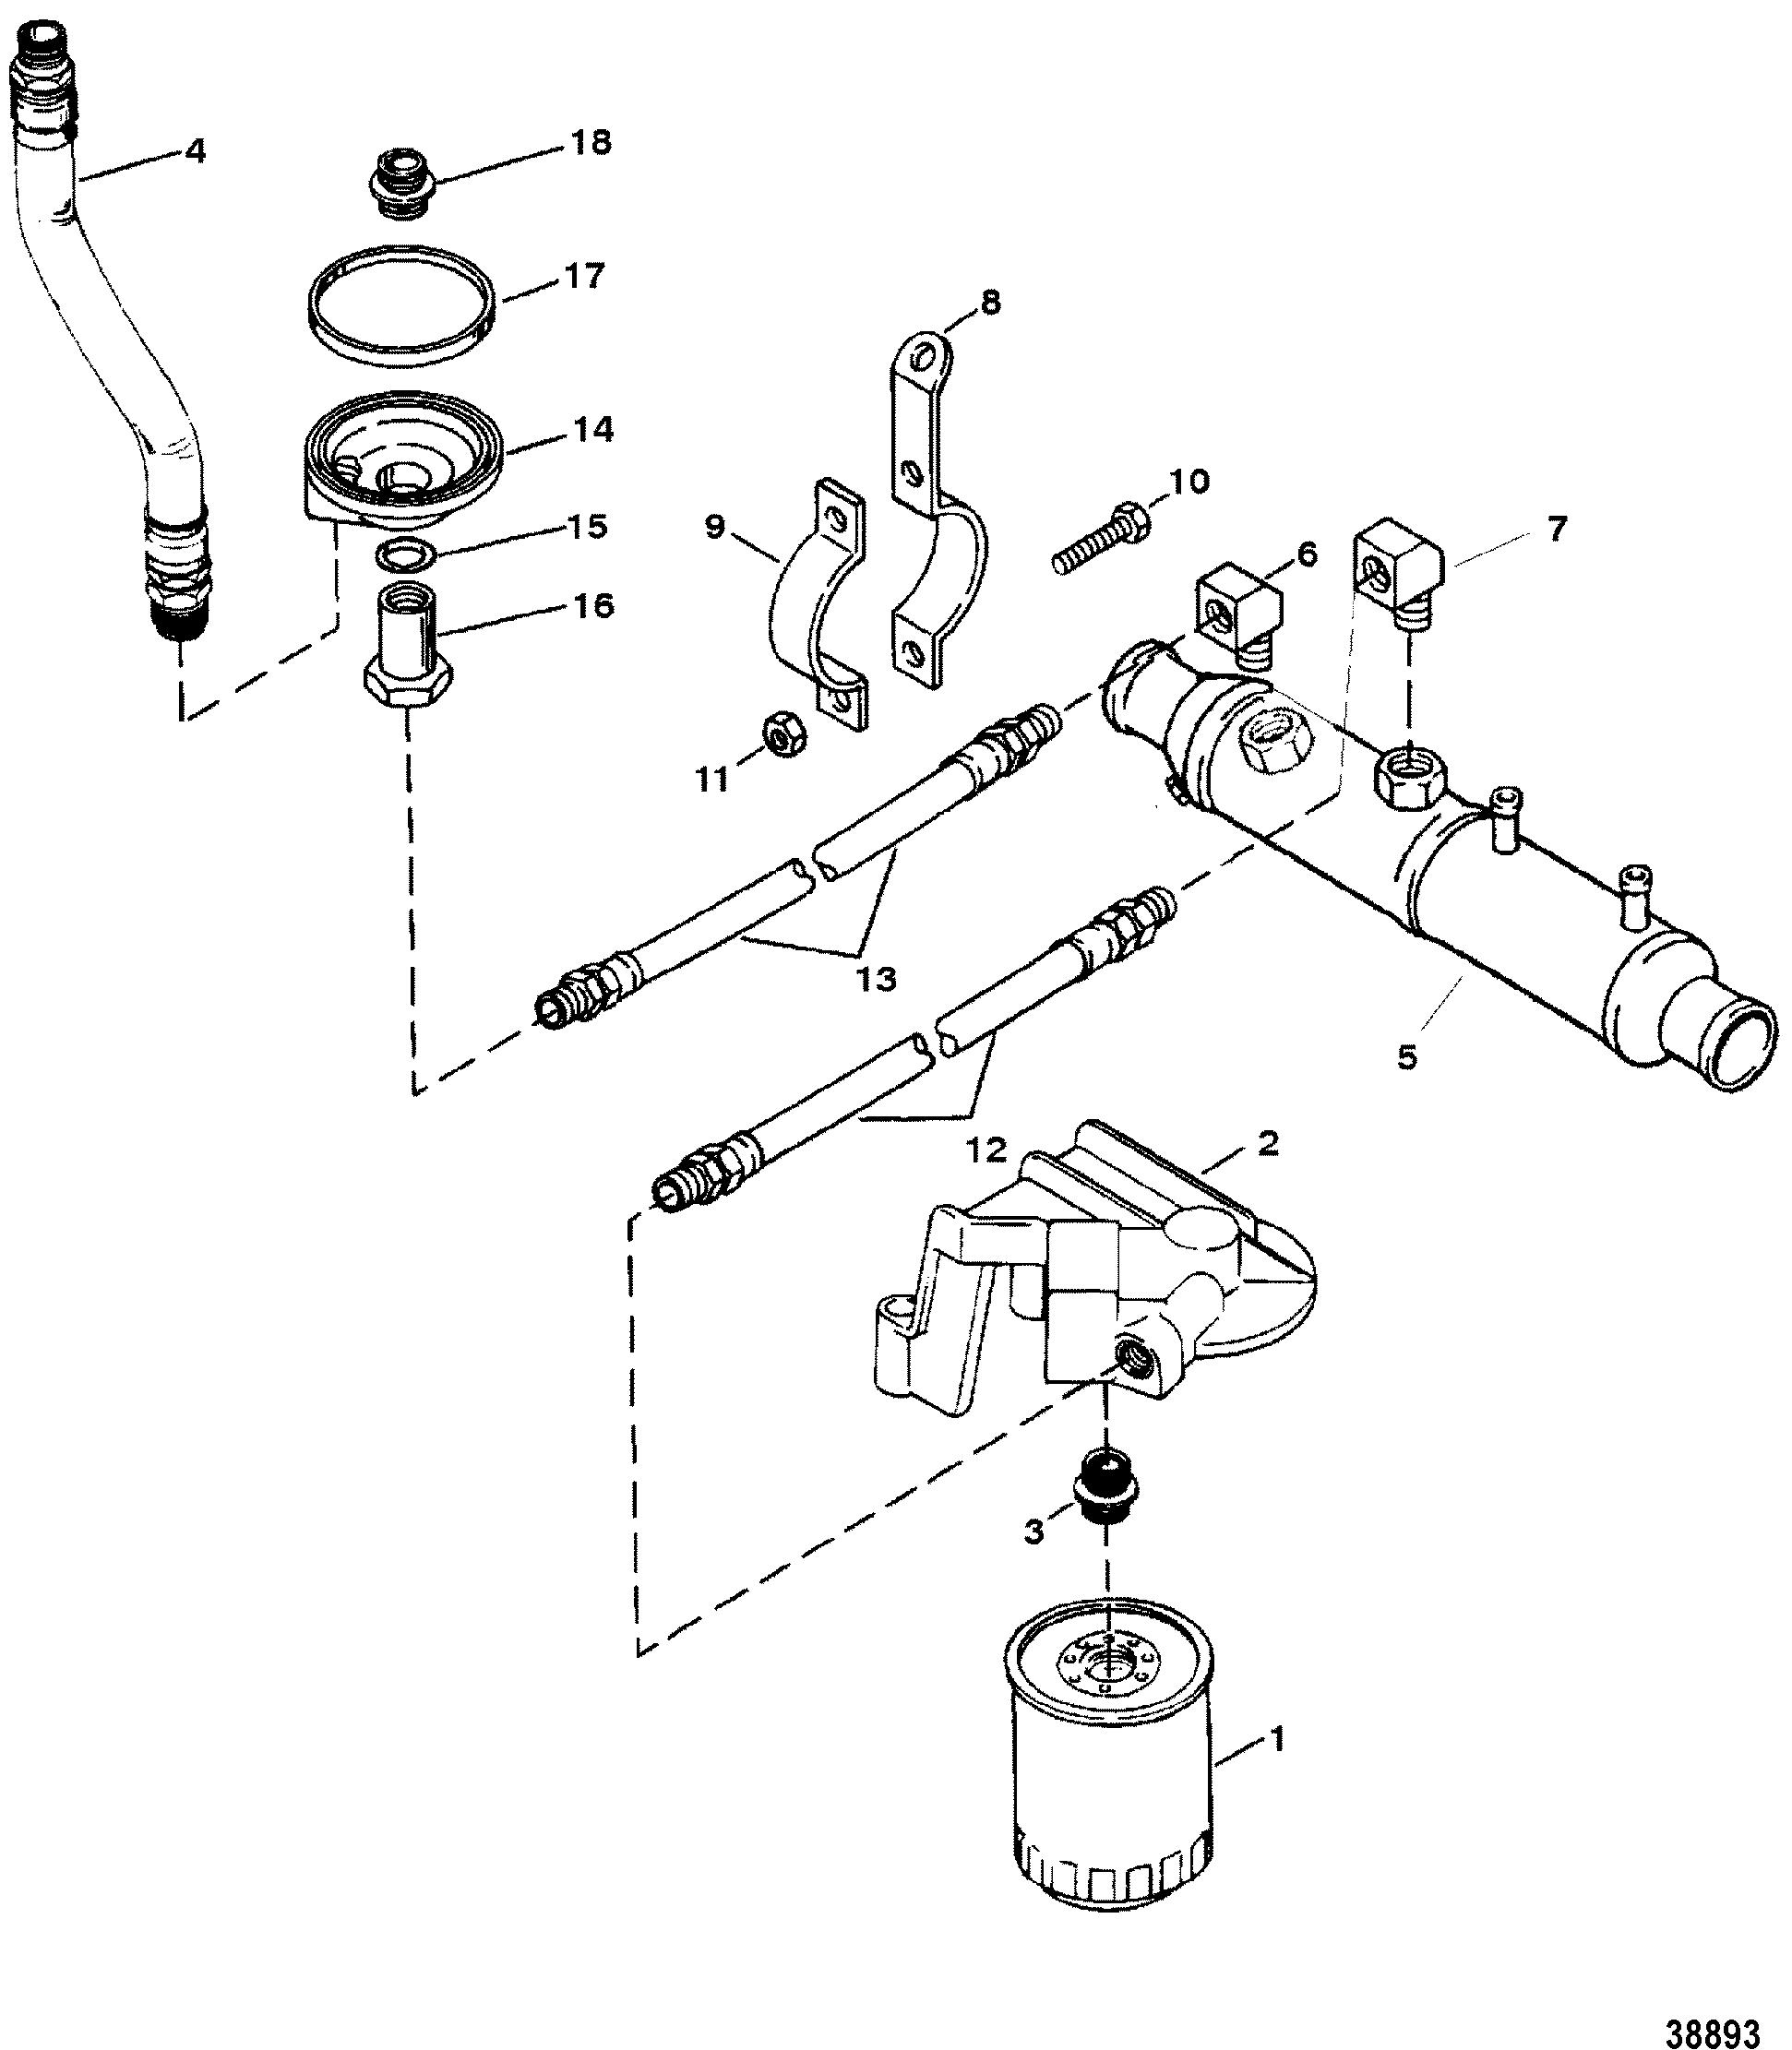 Oil Filter And Adaptor 7 4l Bravo S  N 0f114759  U0026 Below For Mercruiser 7 4l 454 Mag Bravo Gen V